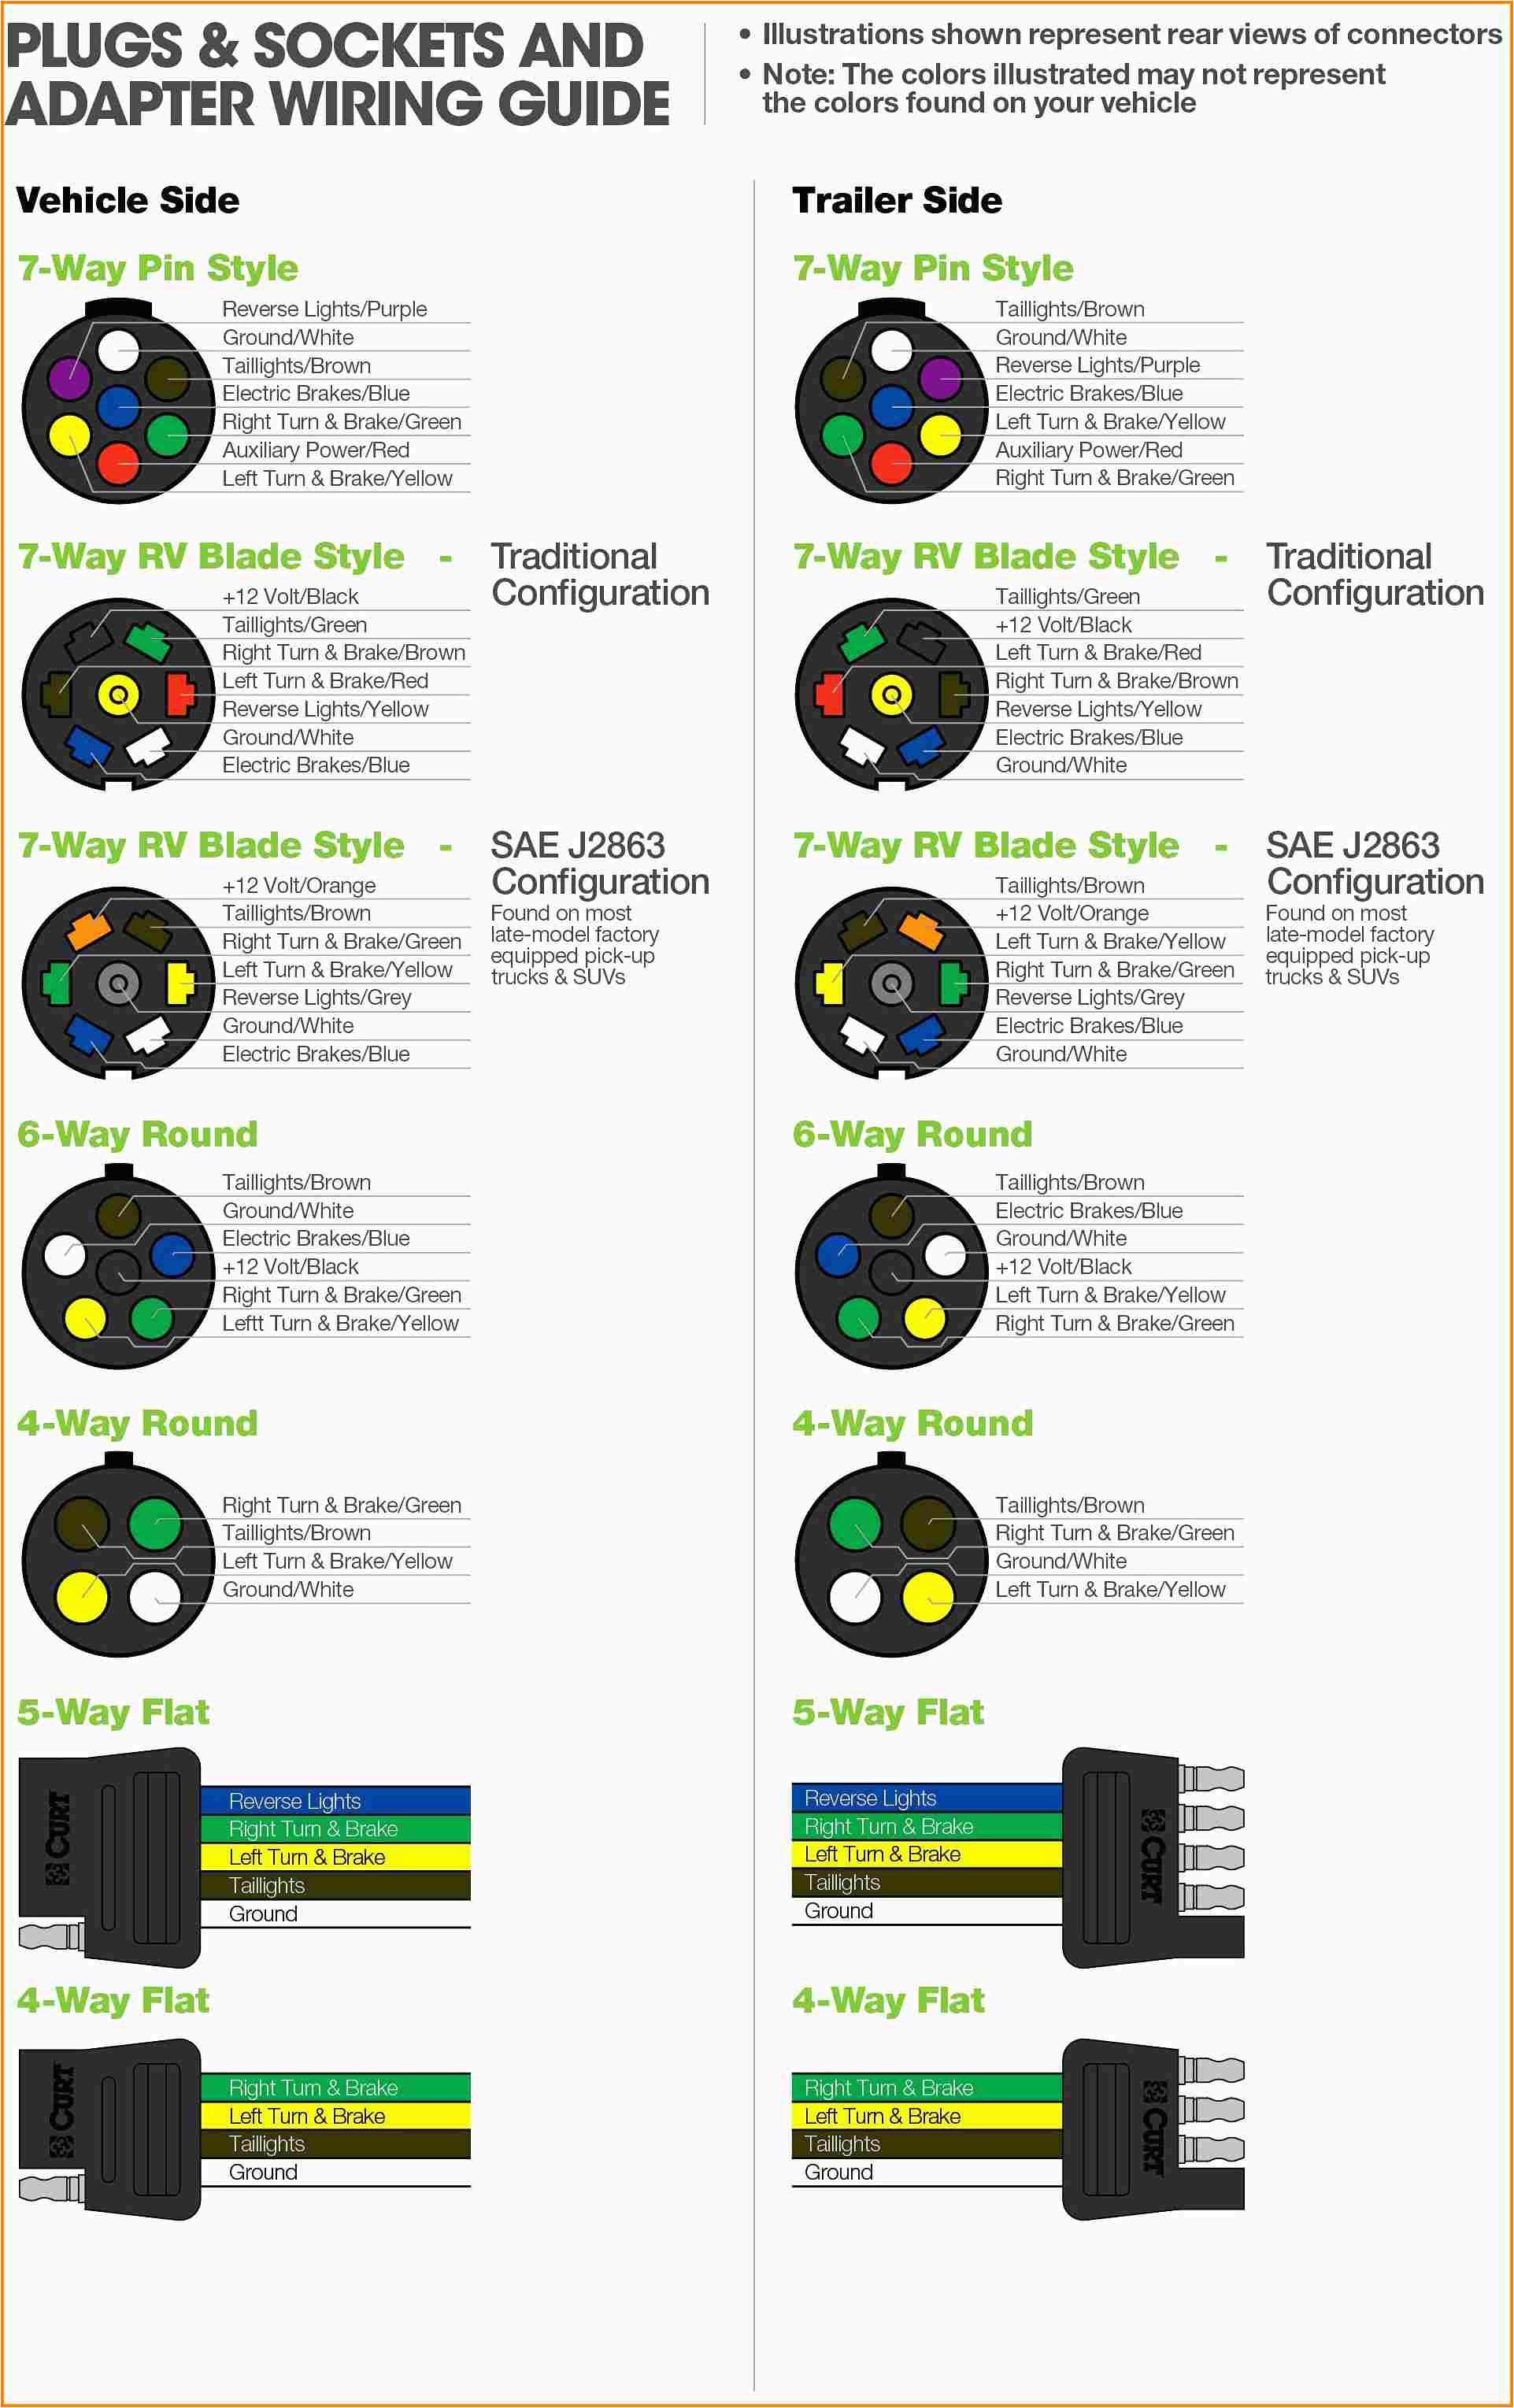 ford 7 pin round trailer plug wiring diagram wiring diagram option 6 pin round trailer wiring diagram free download